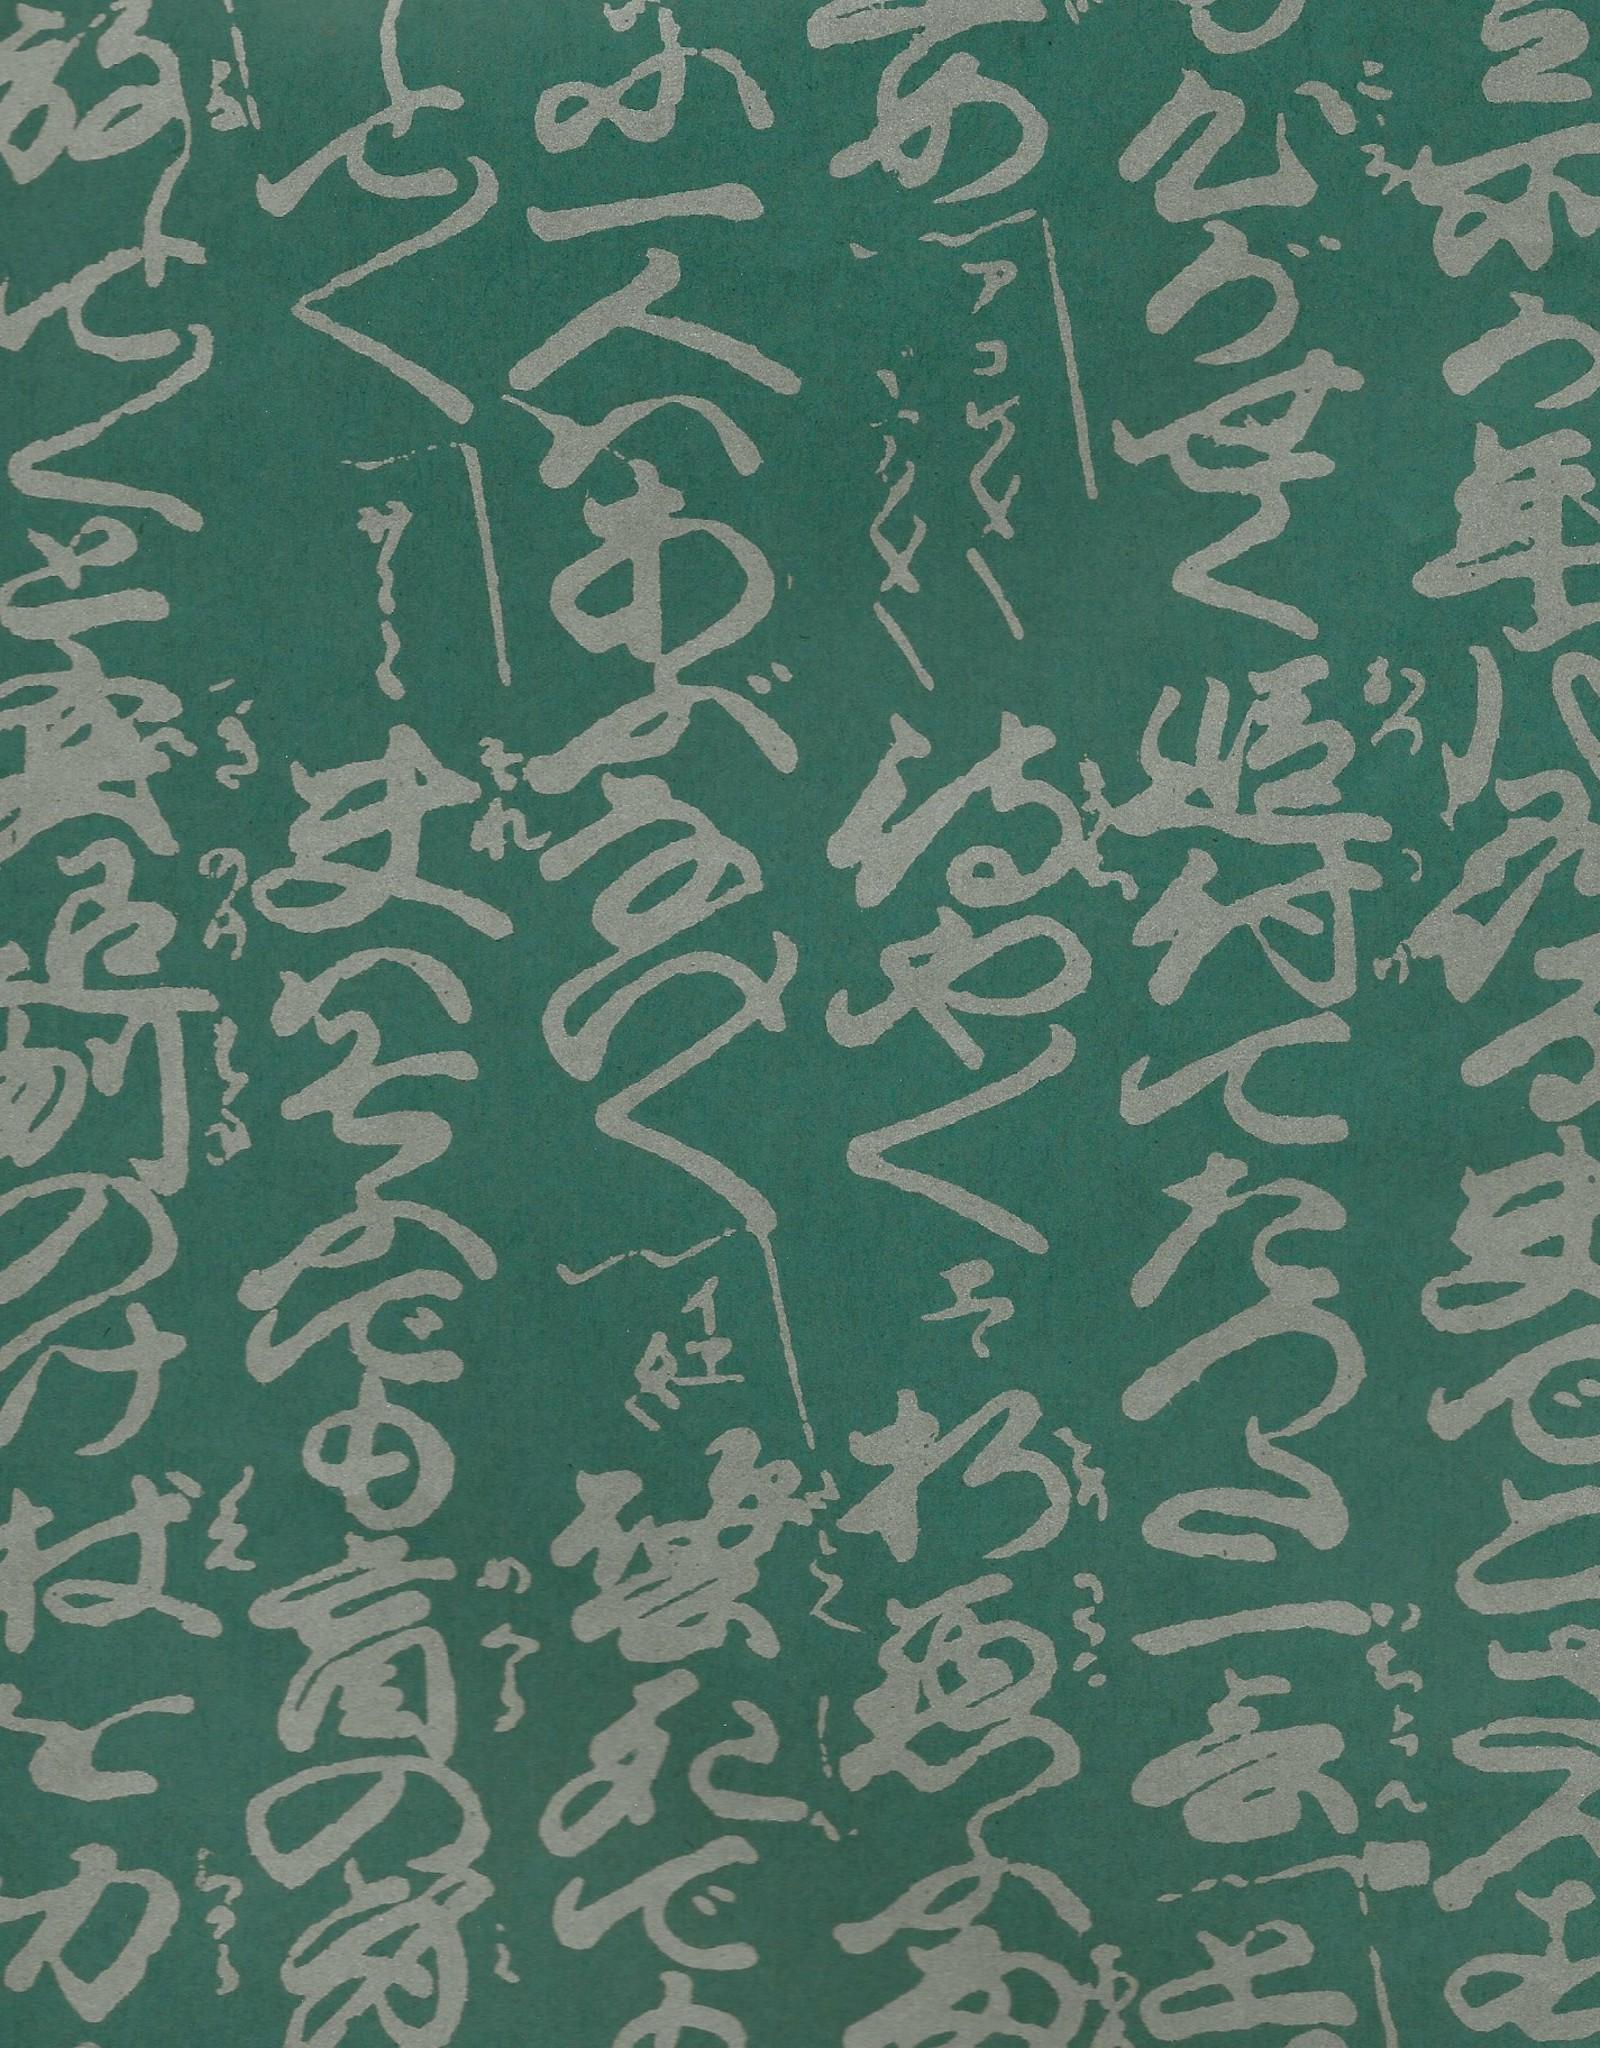 "Japanese Hogodaiyou, Silver Calligraphy on Green, 19"" x 25"""